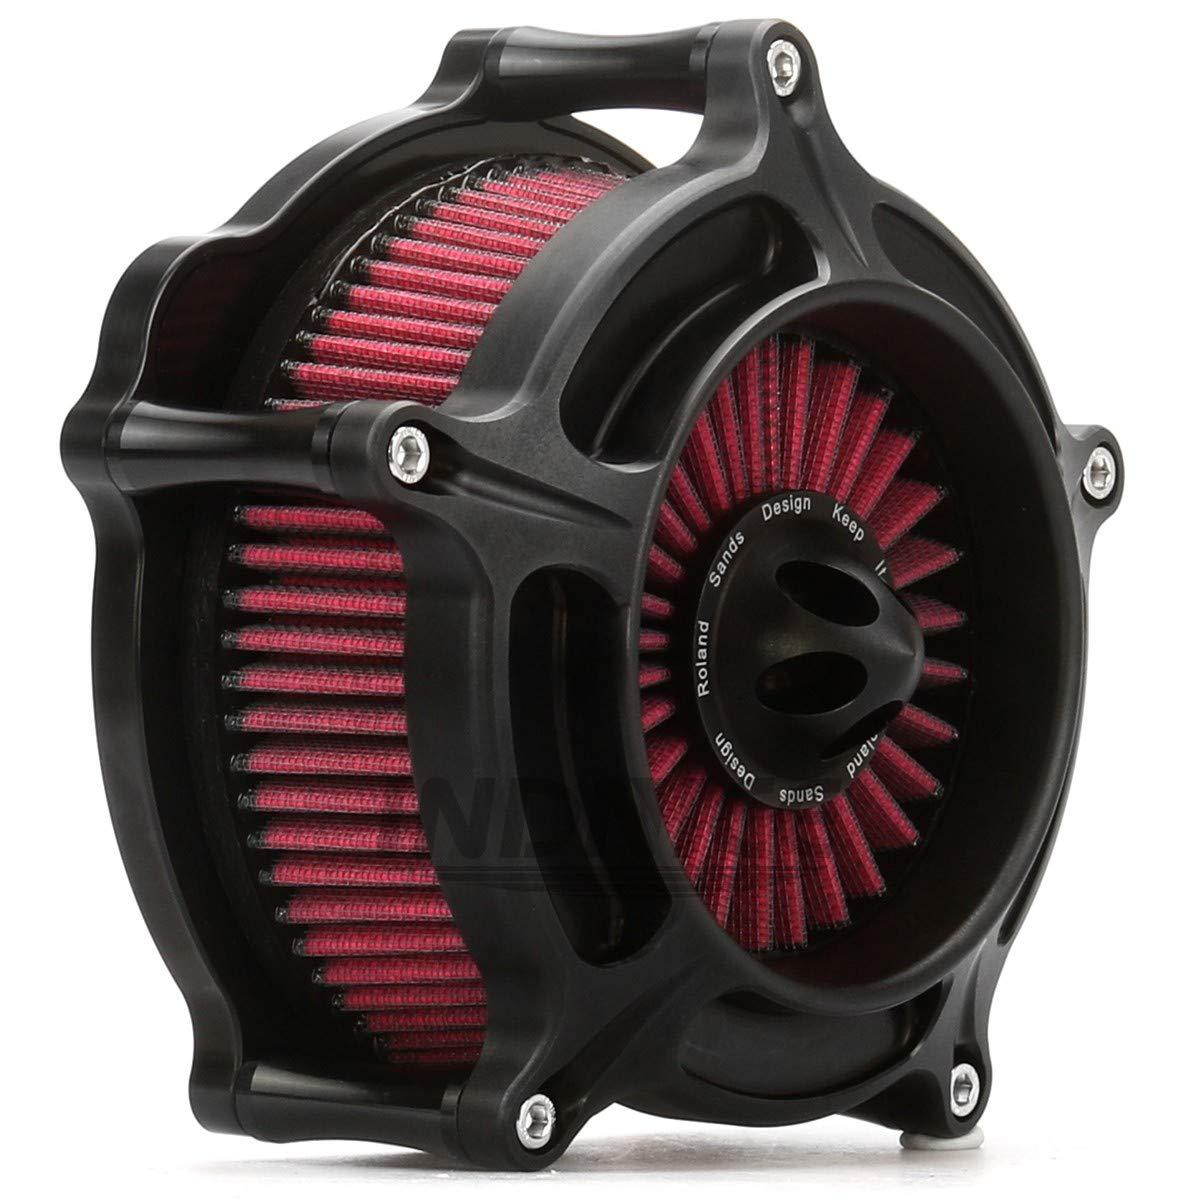 Filtro aspirazione moto Black Turbine Air Cleaner per Harley Sportster 1200 883 Forty Eight 91-15